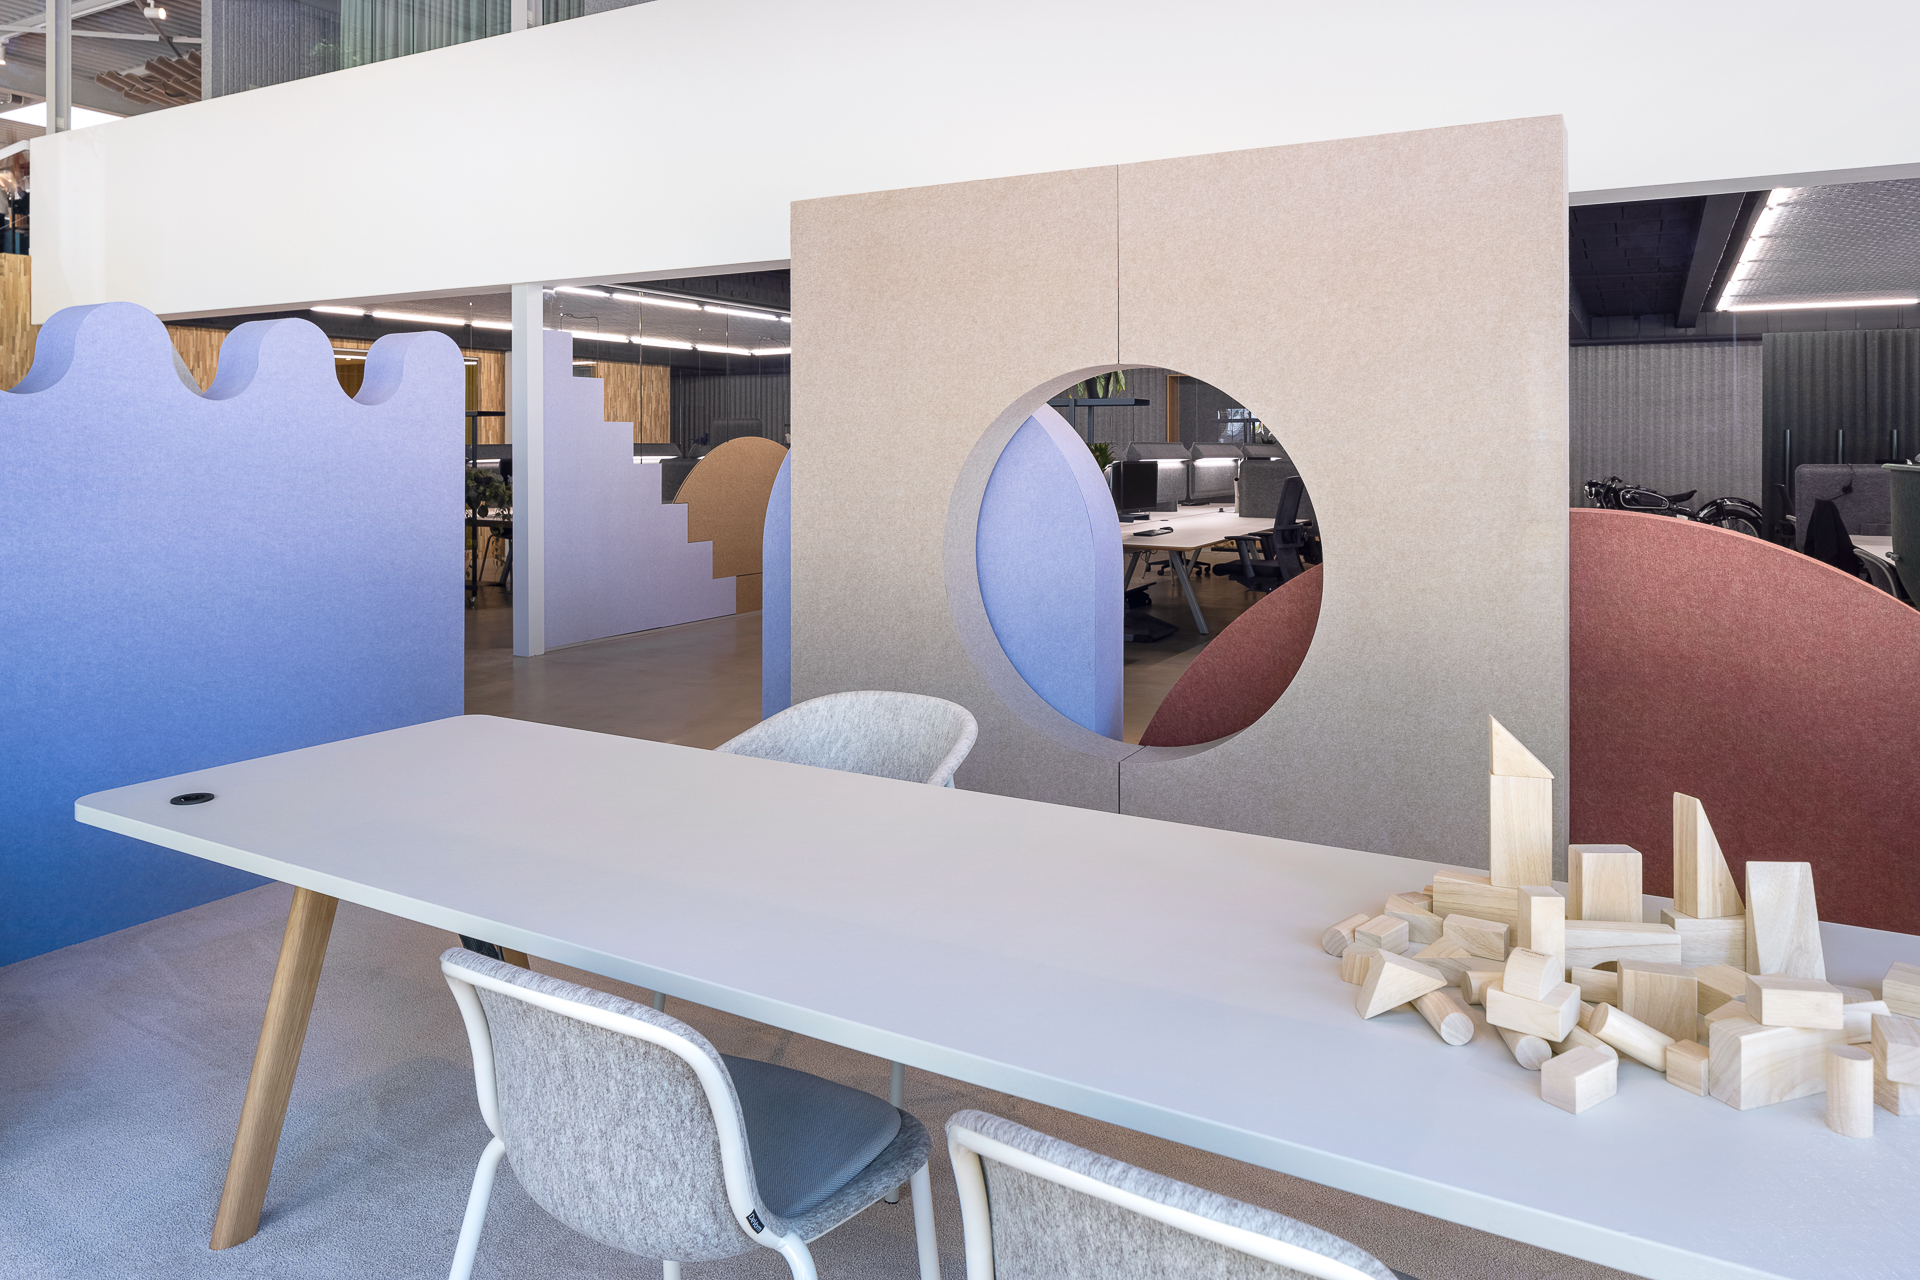 De Vorm Showroom and Offices - PET Felt products 3